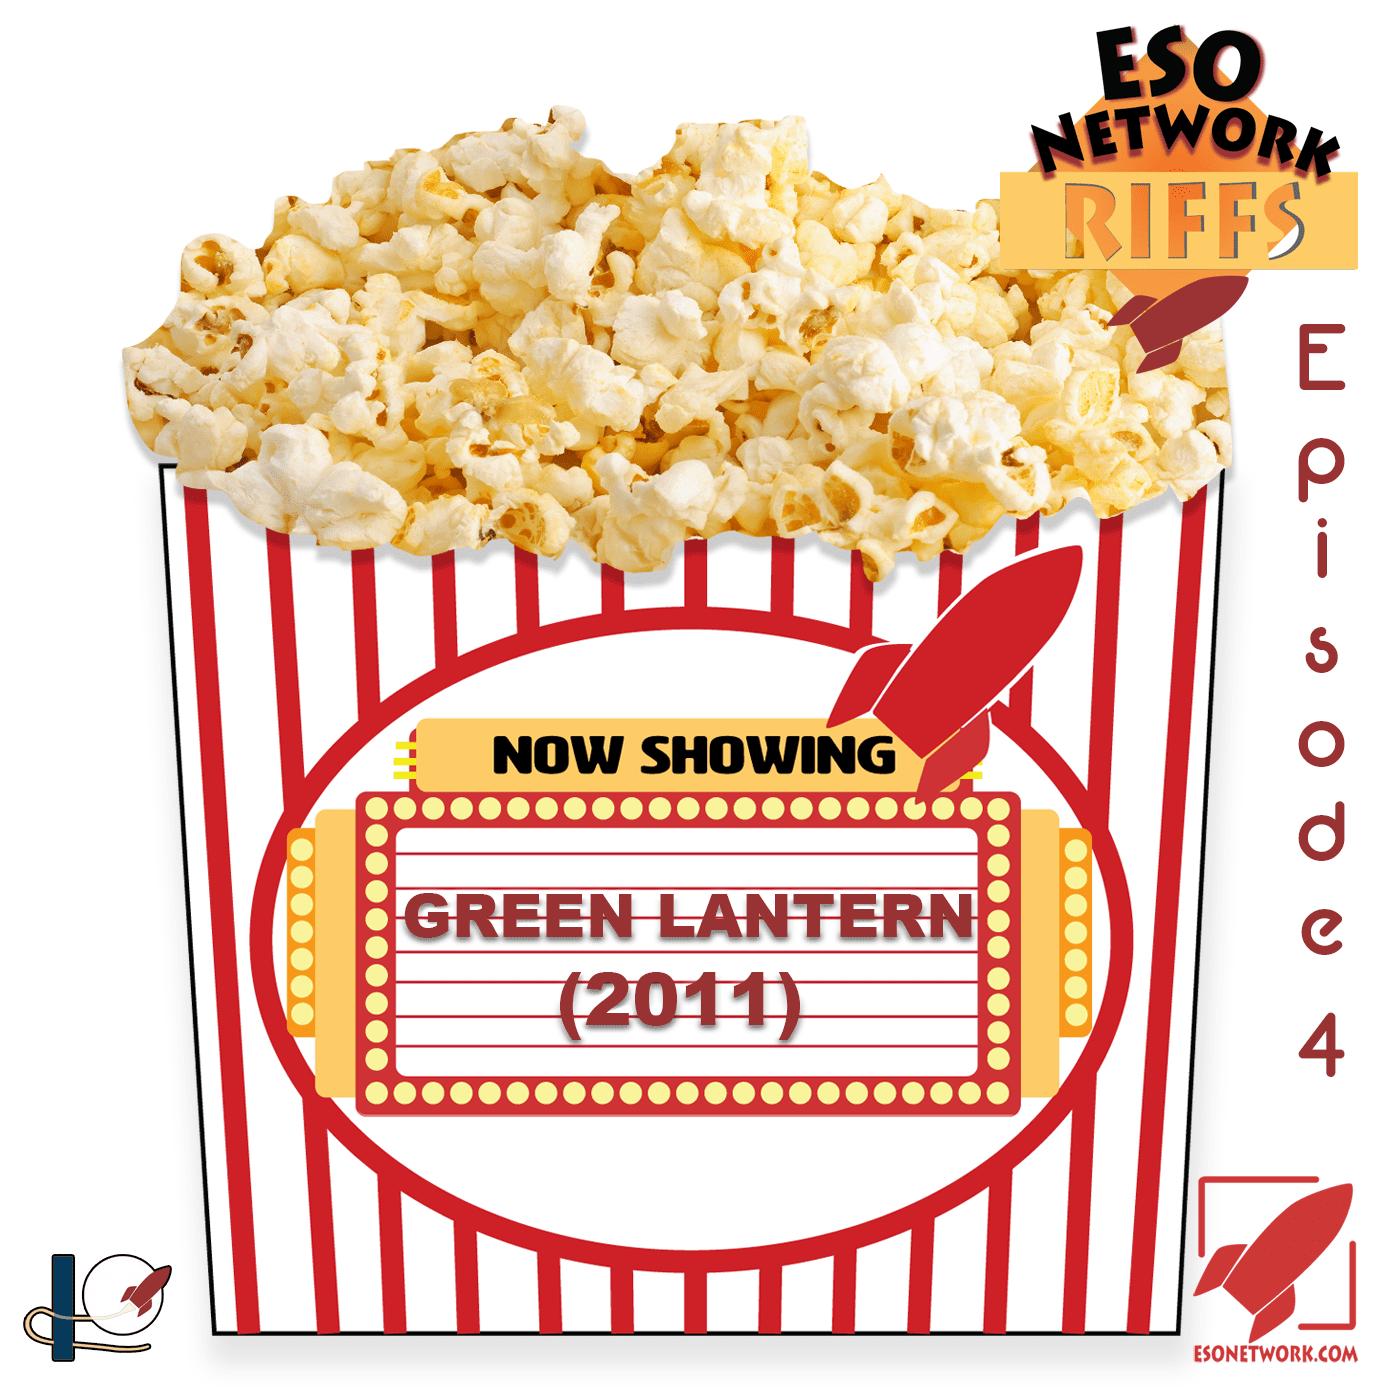 ESO Network Riffs - Green Lantern (2011)